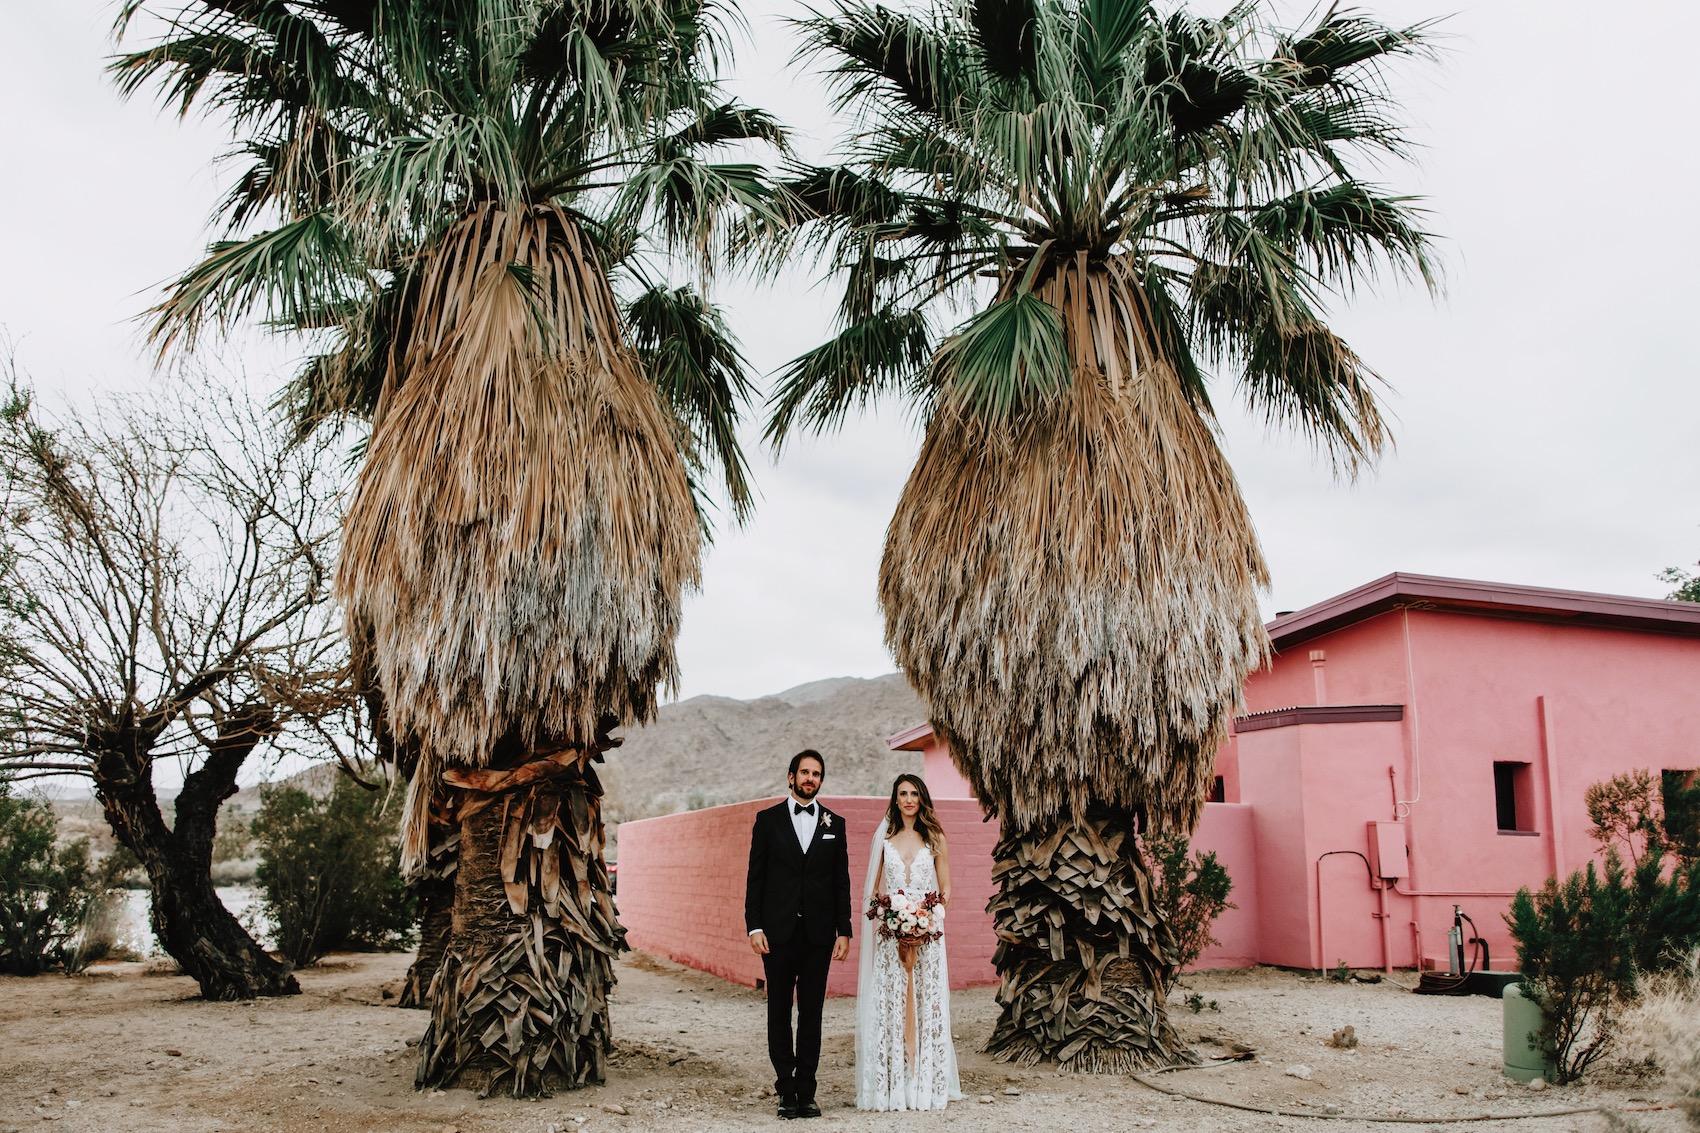 29-Palms-Inn-Joshua-Tree-Jewish-Wedding-H+M-51.JPG